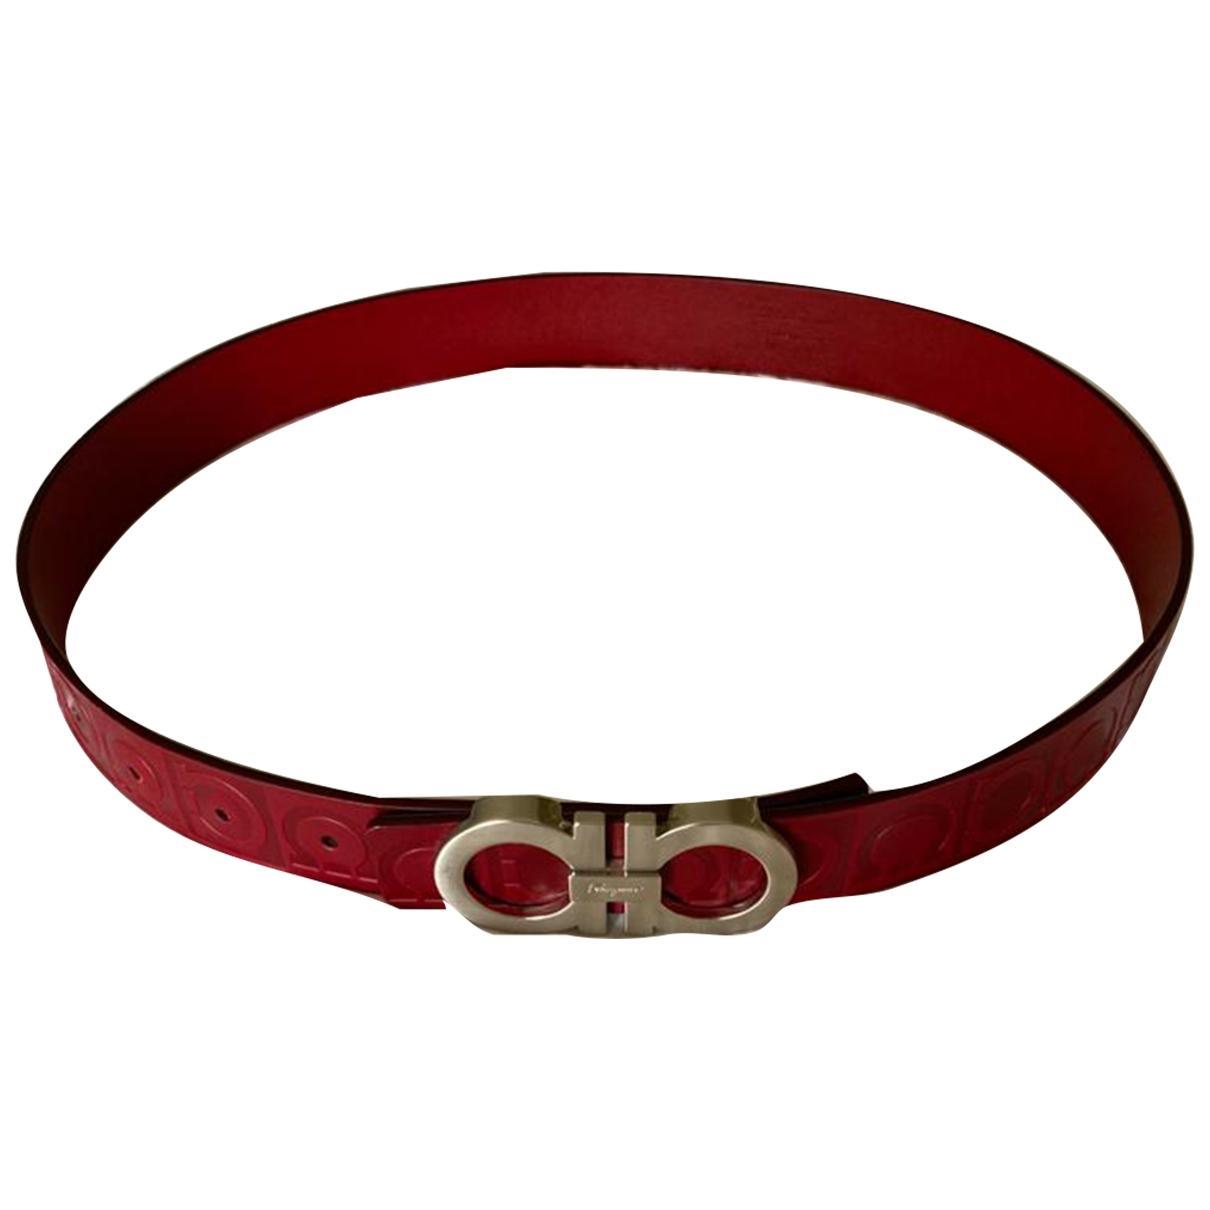 Salvatore Ferragamo \N Red Leather belt for Men 35 Inches